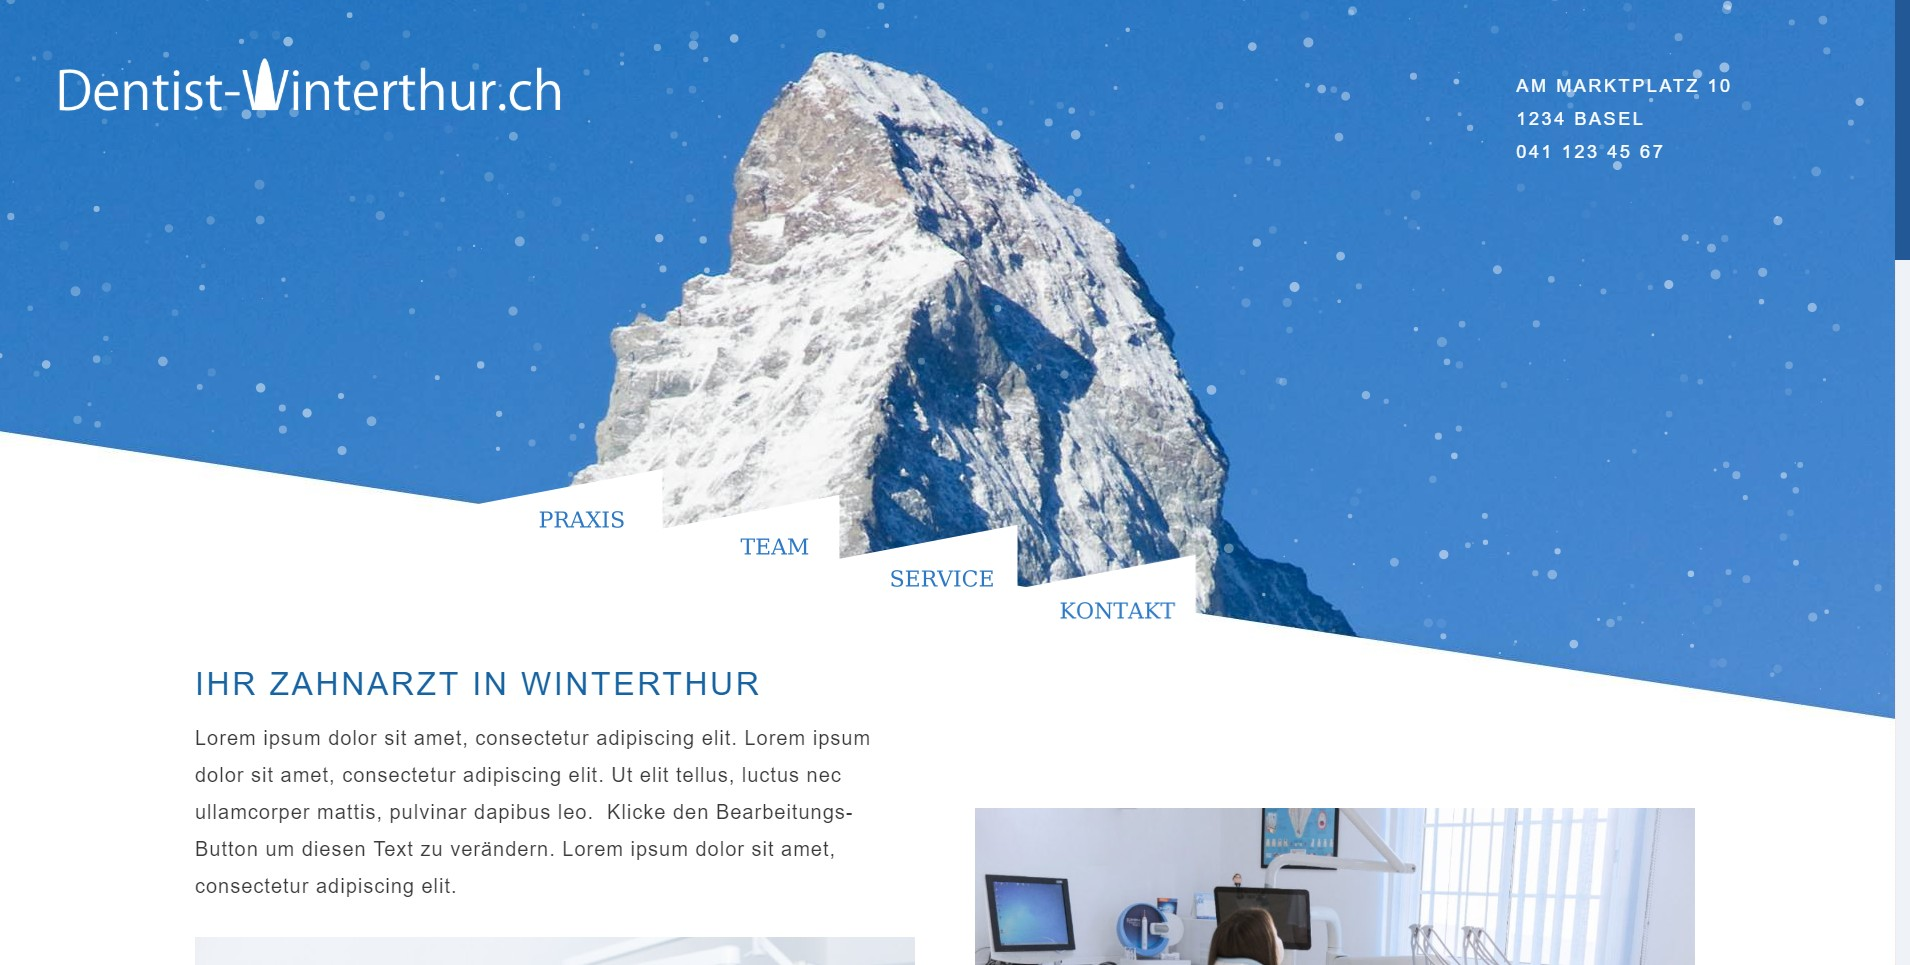 Dentist-Winterthur.ch